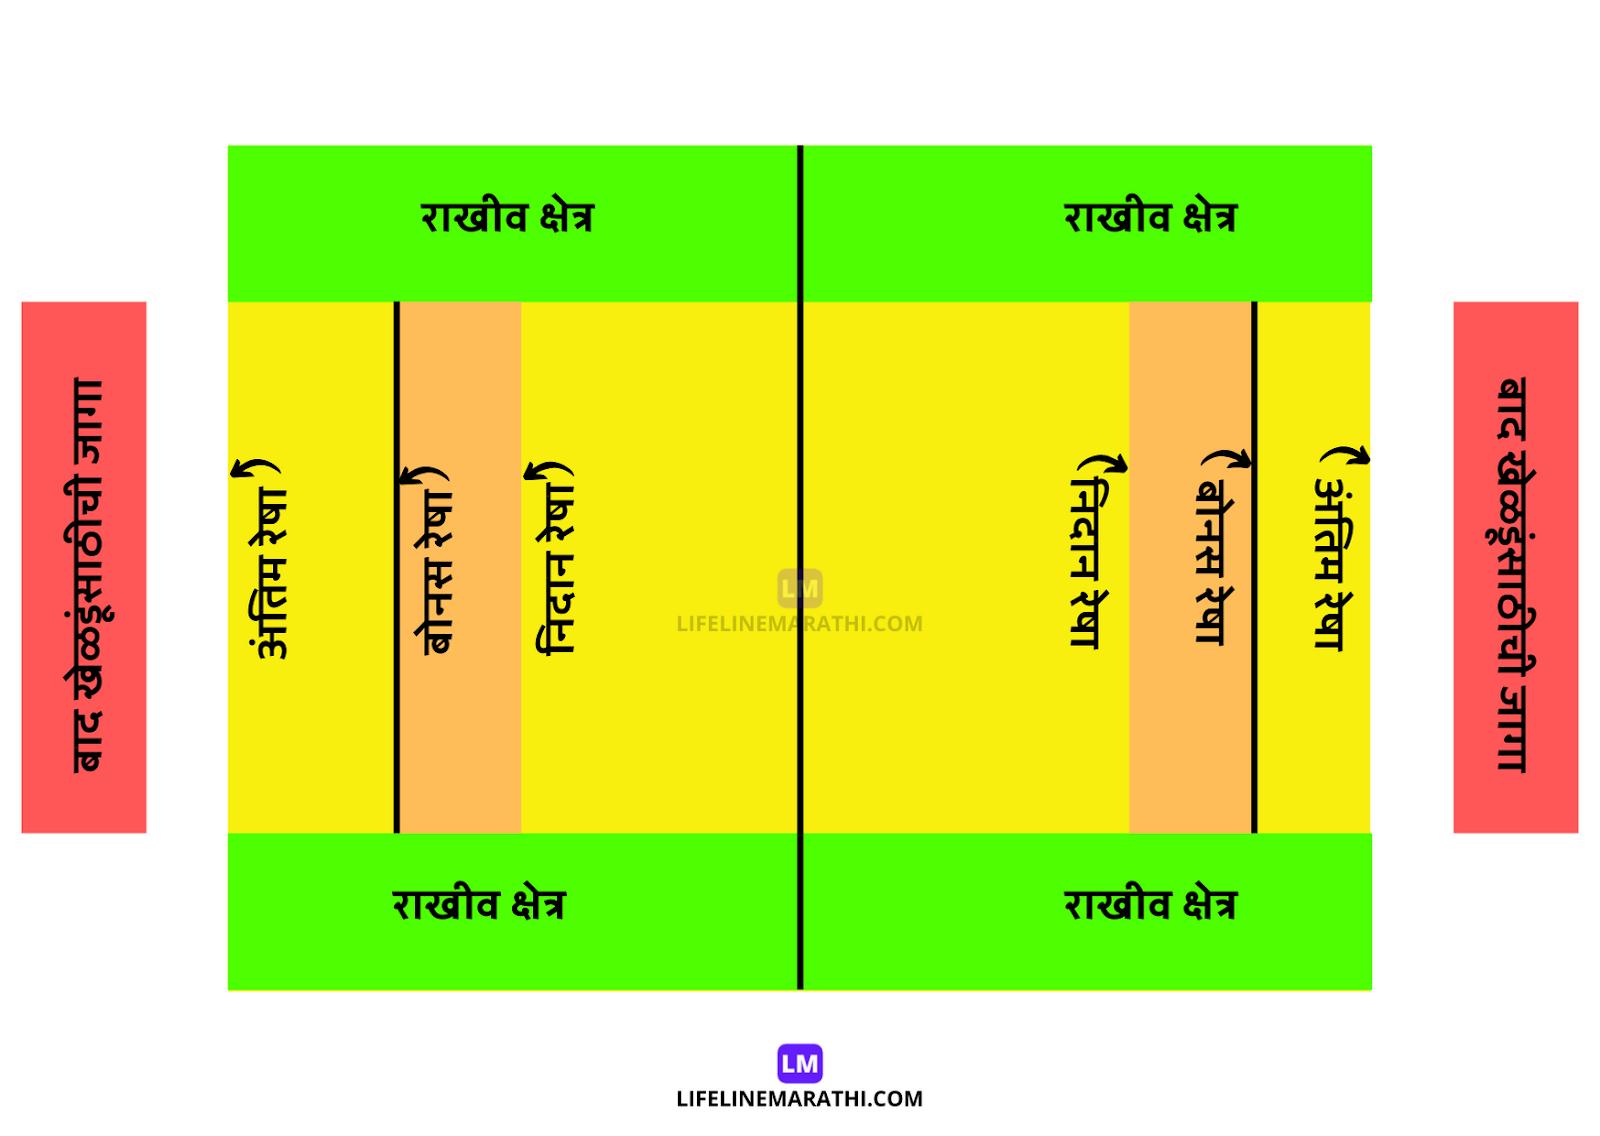 kabaddi ground, kabaddi information in marathi